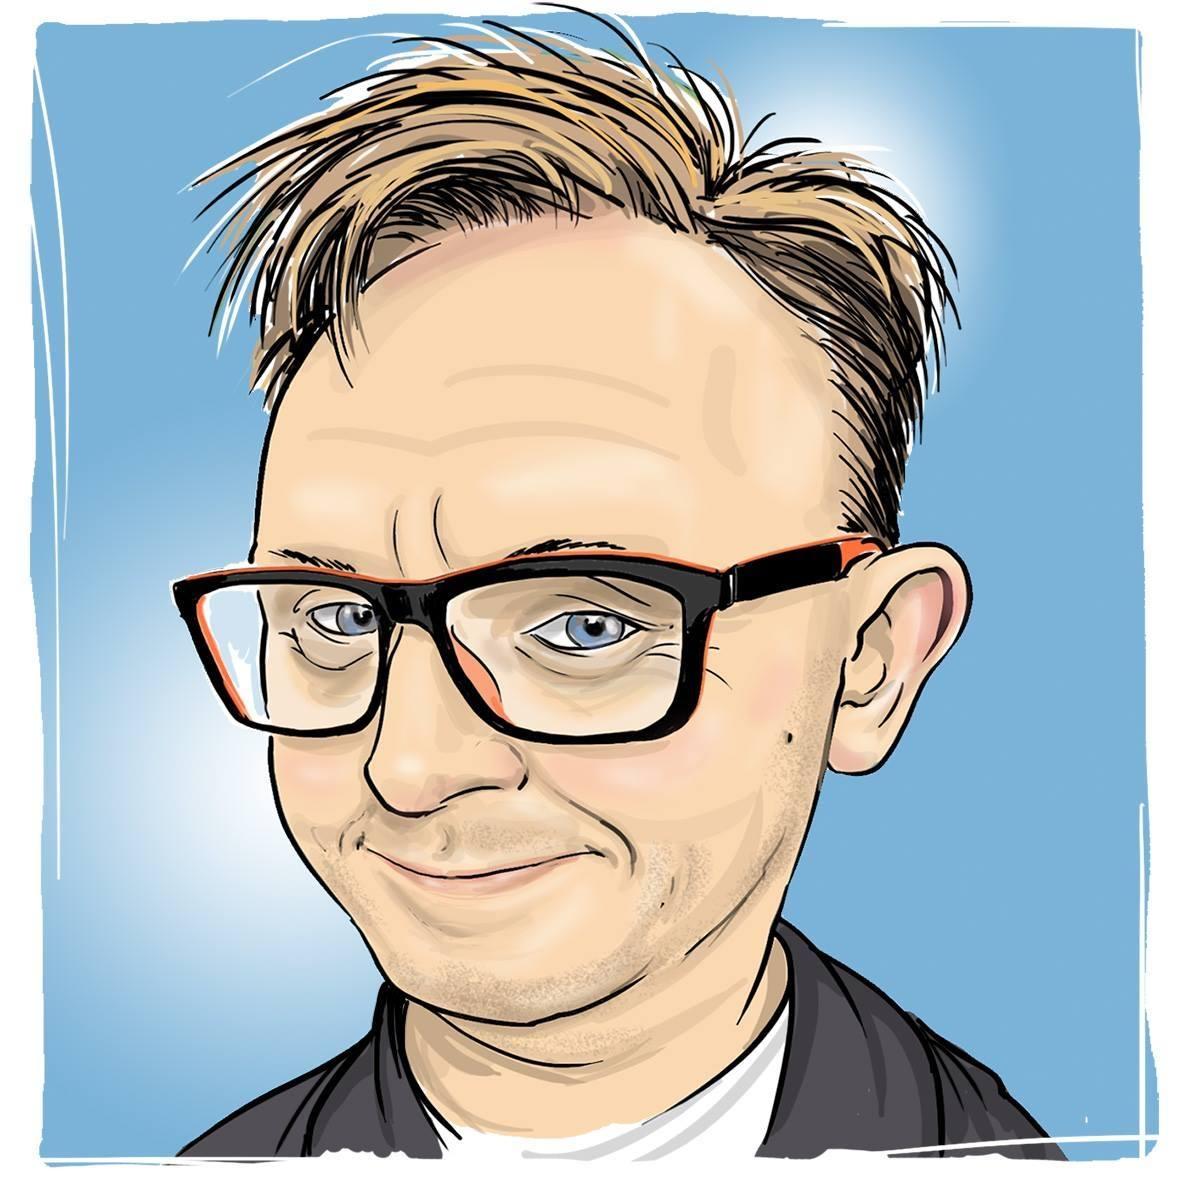 Mirosław Stankiewicz karykatura obraz digital painting stan mir studio